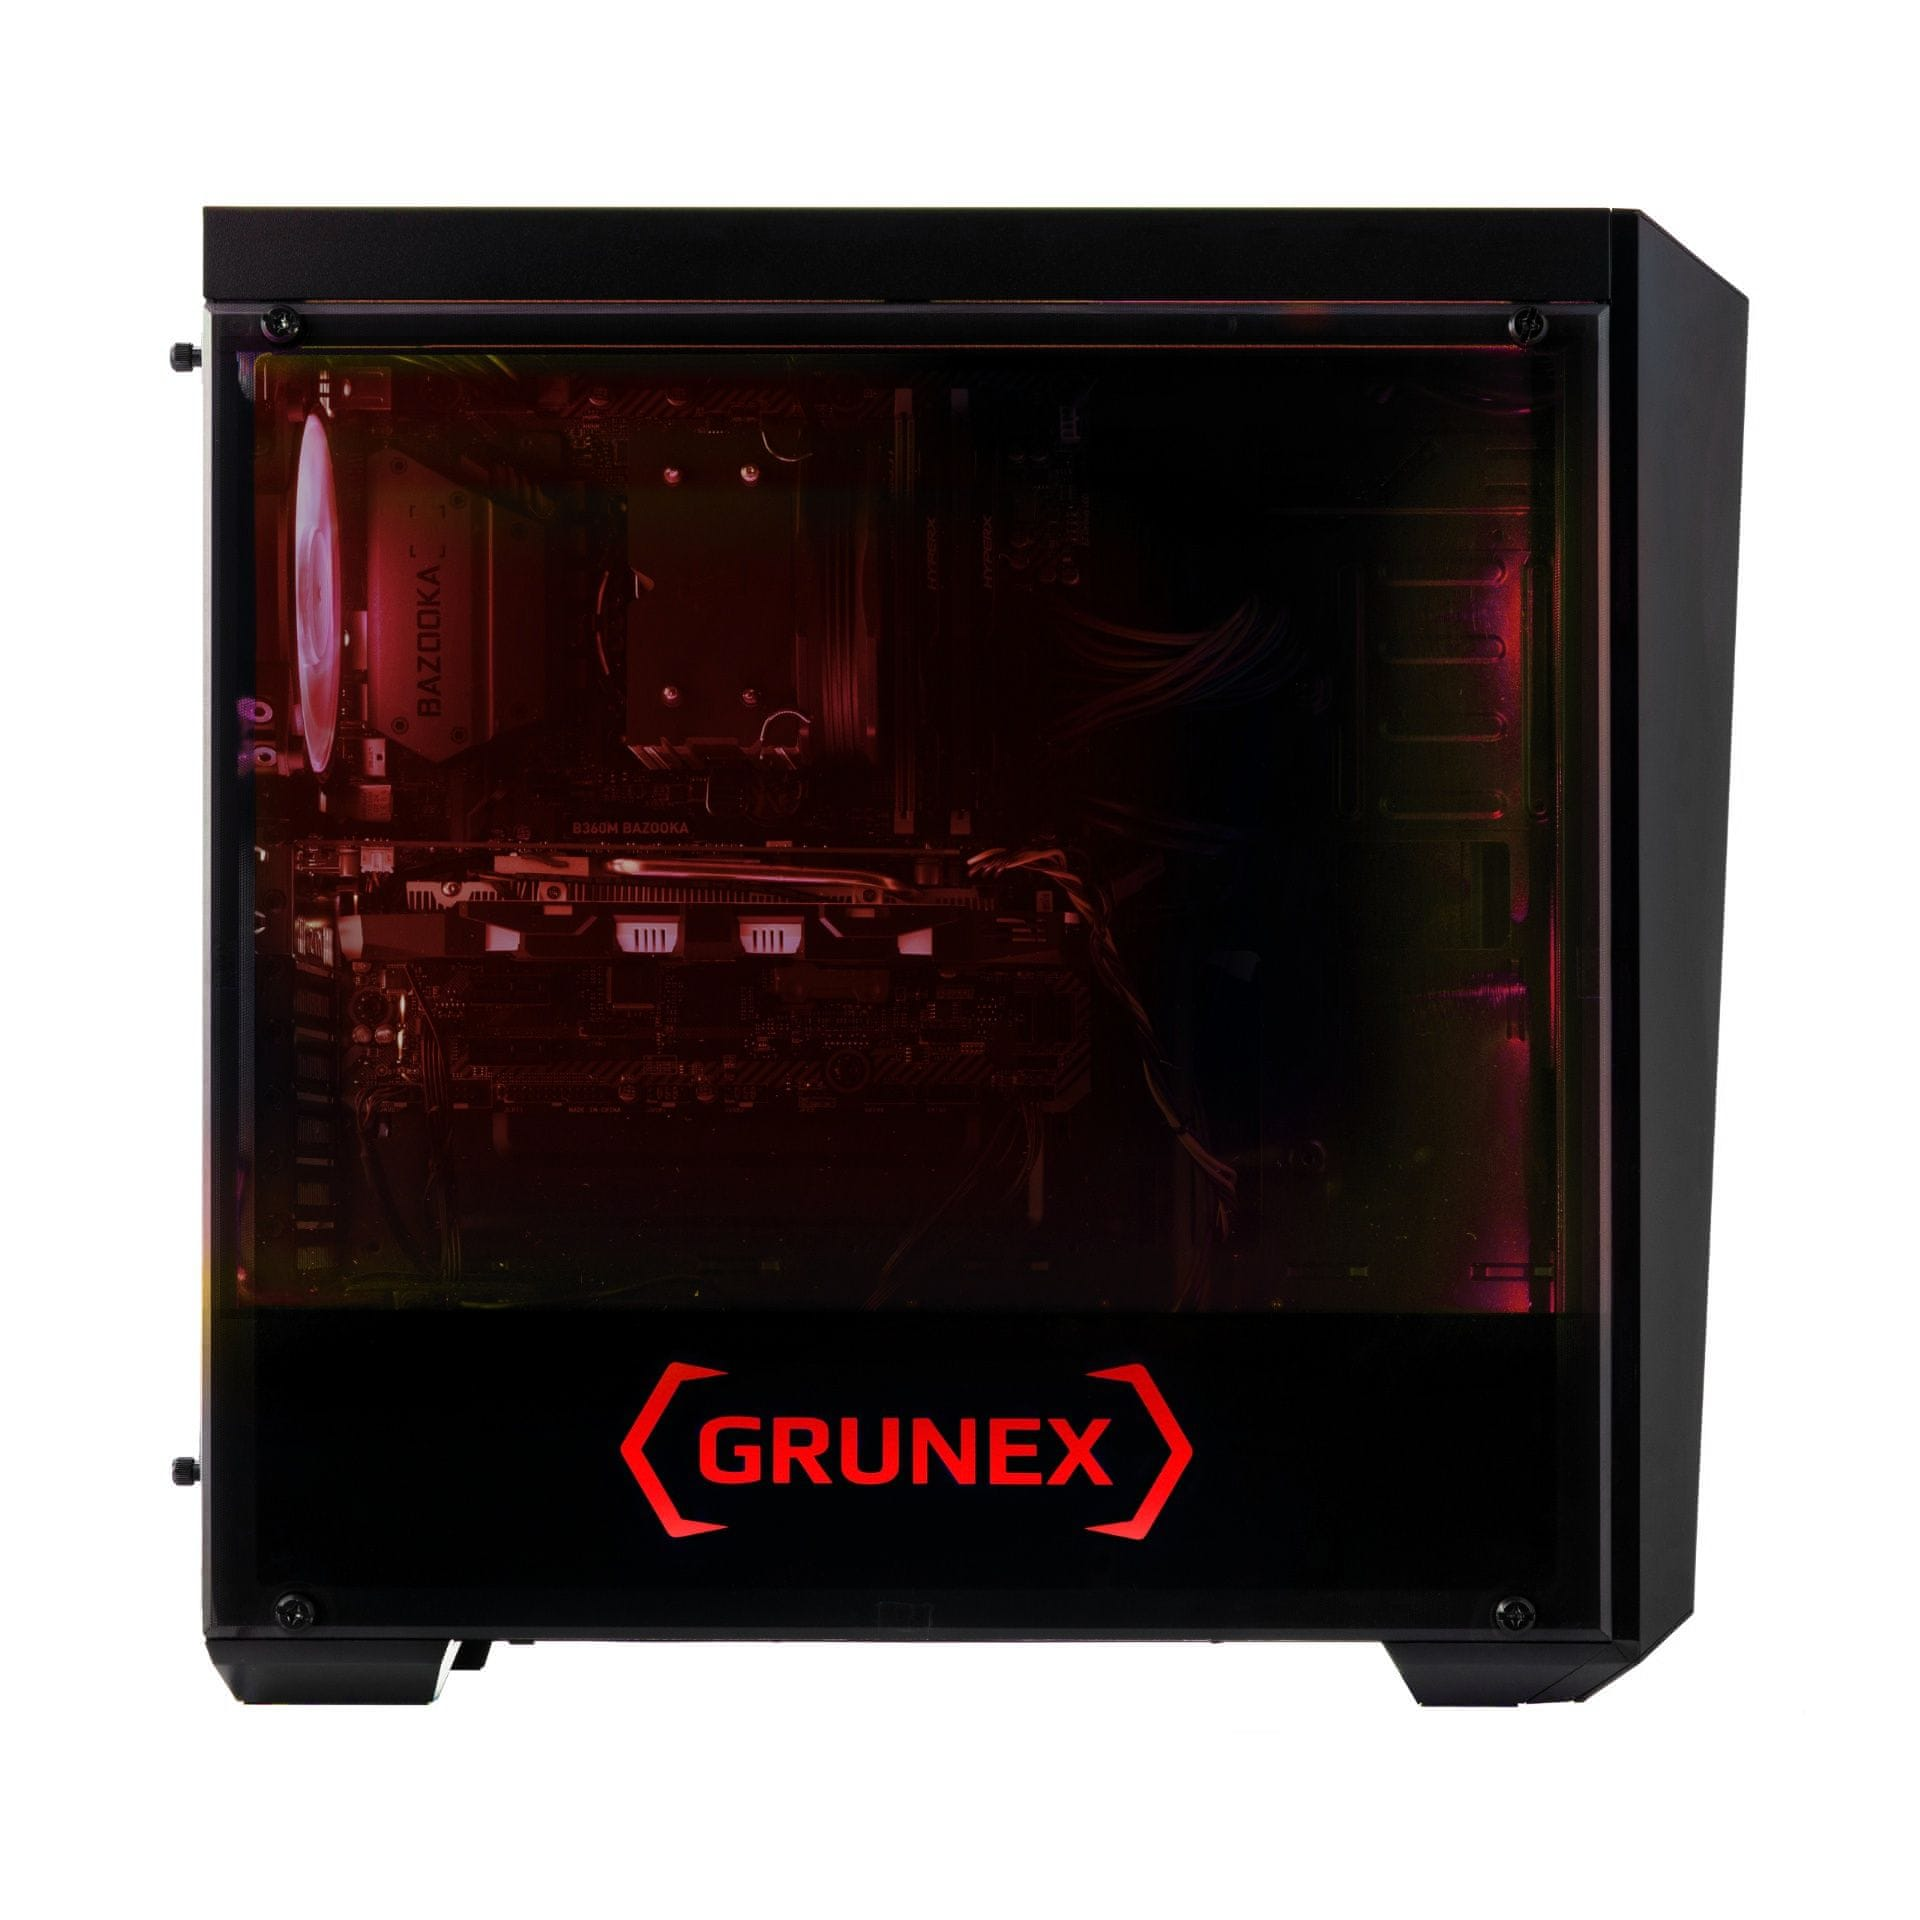 LYNX Grunex